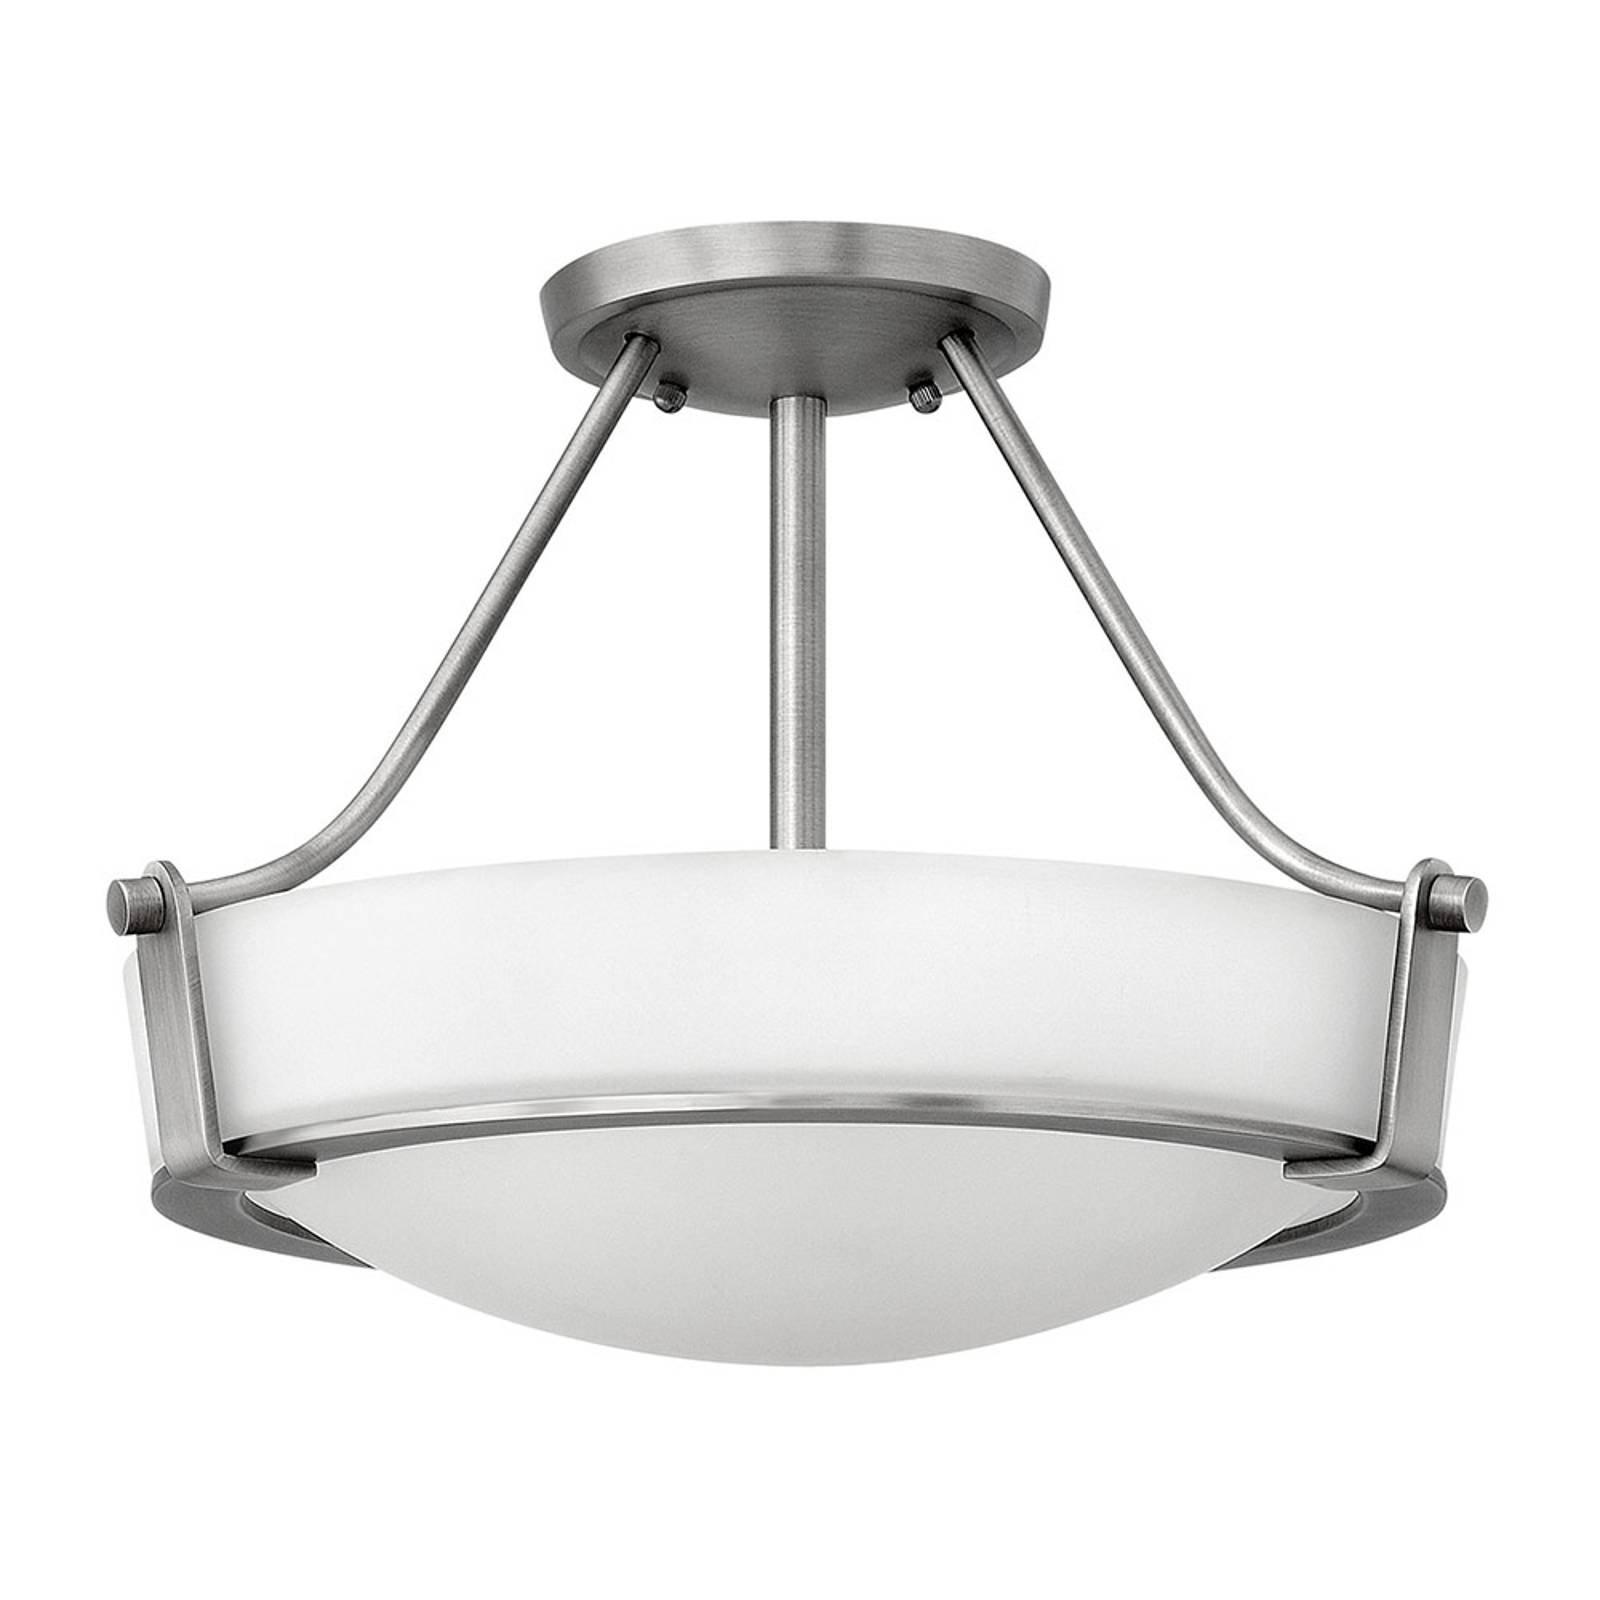 Hathaway taklampe med avstandsstykke, nikkel Ø41cm